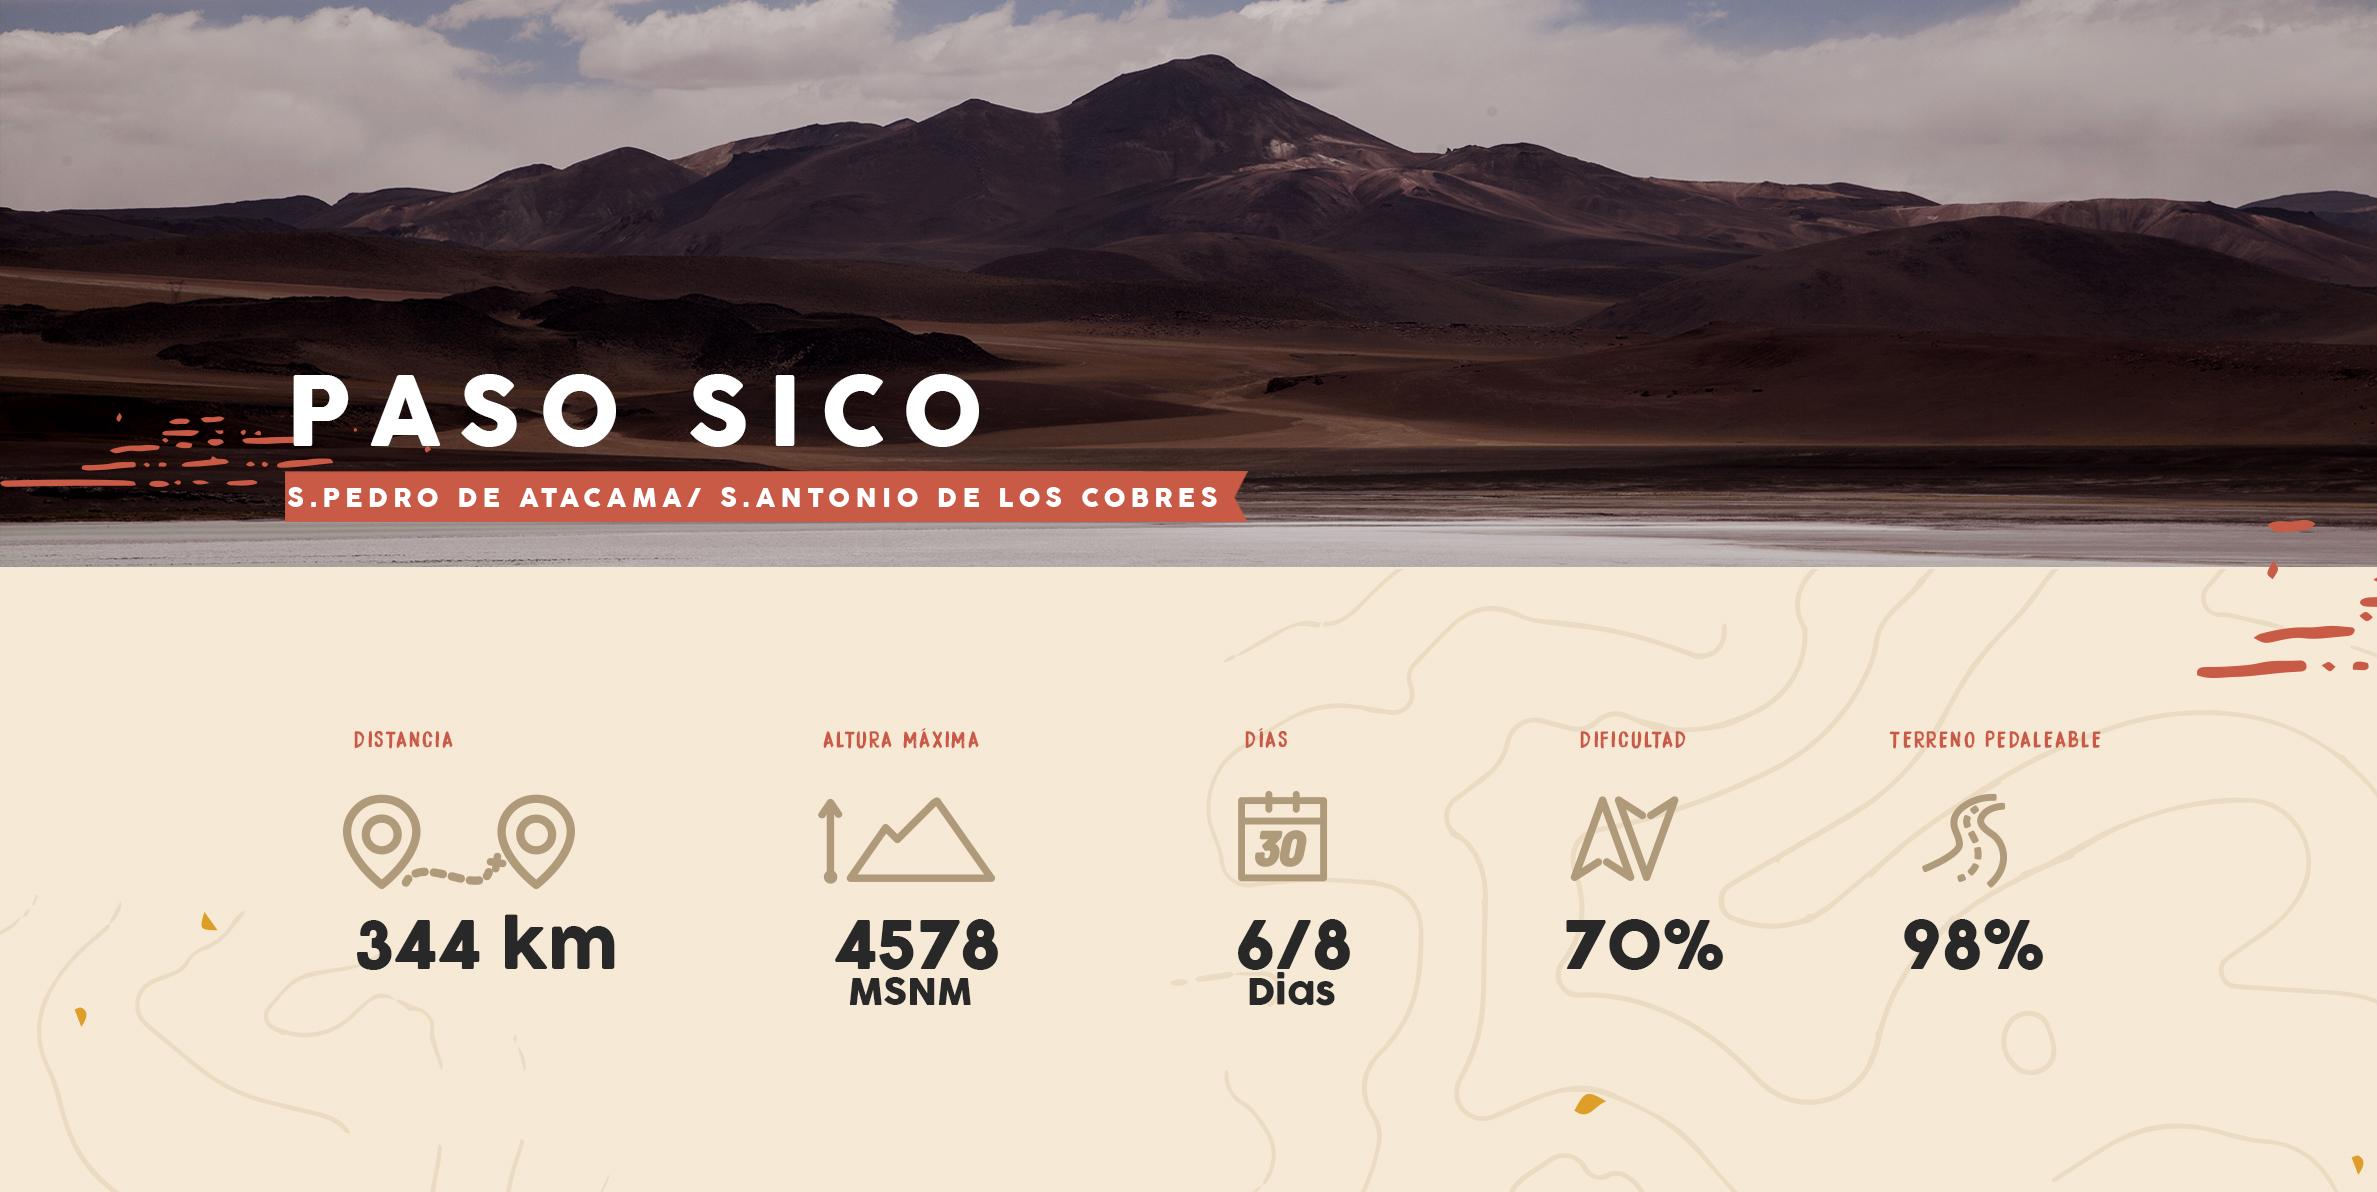 Paso Sico